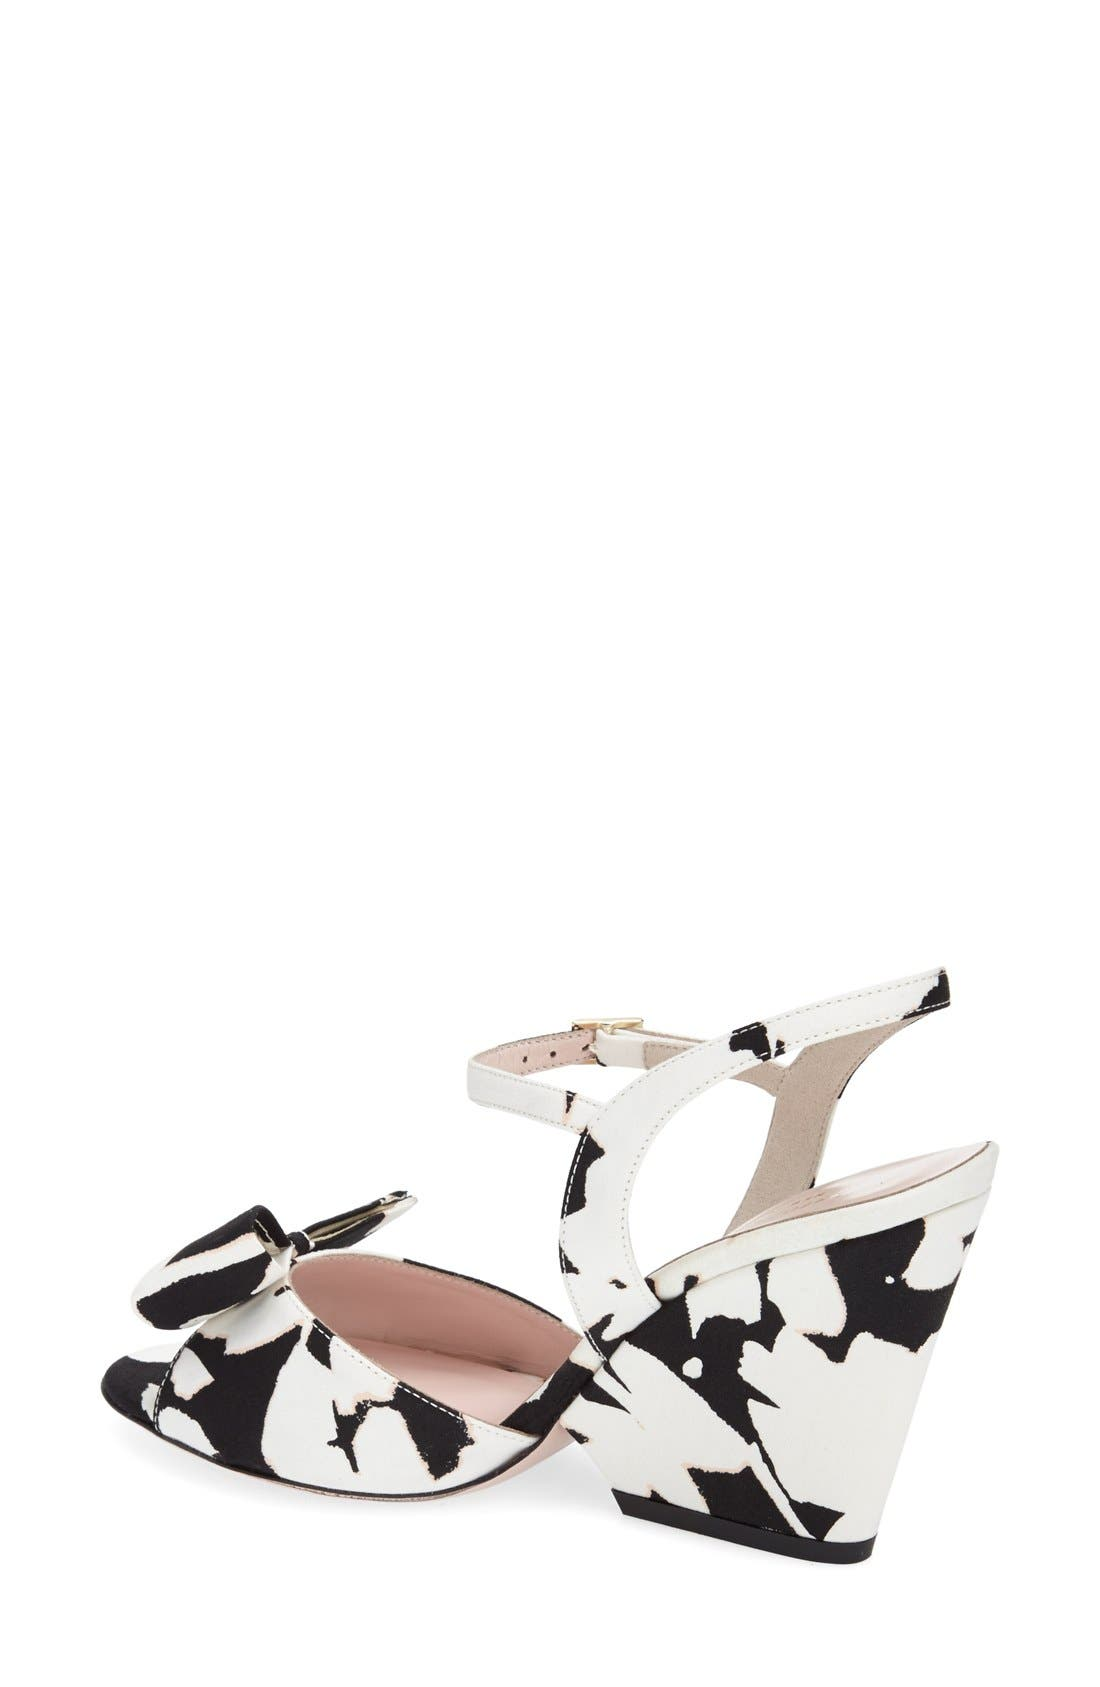 KATE SPADE NEW YORK, 'imari' satin ankle strap sandal, Alternate thumbnail 4, color, 001